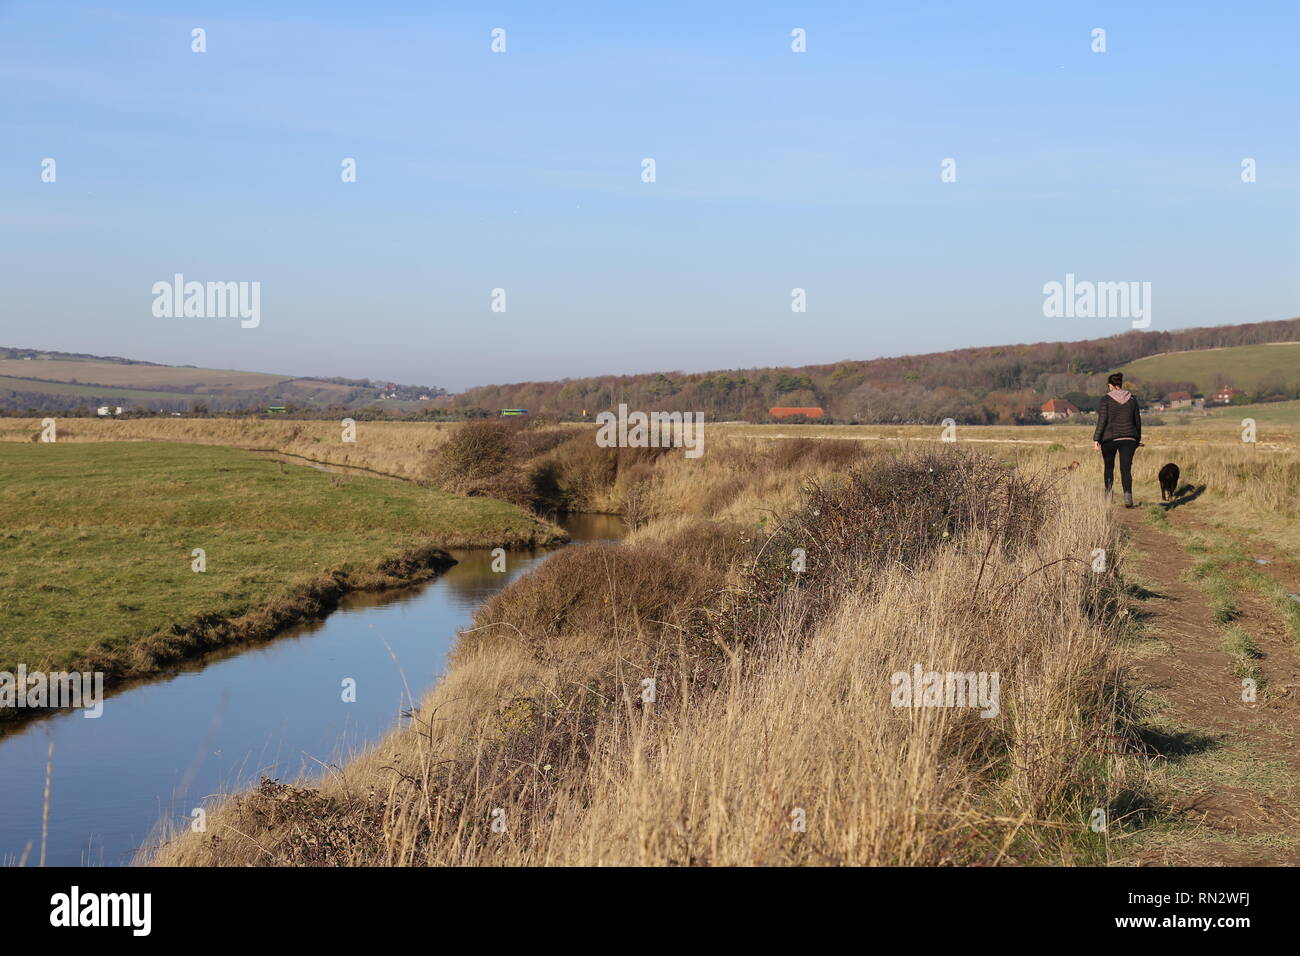 Woman walking dog along river in sunshine - Stock Image